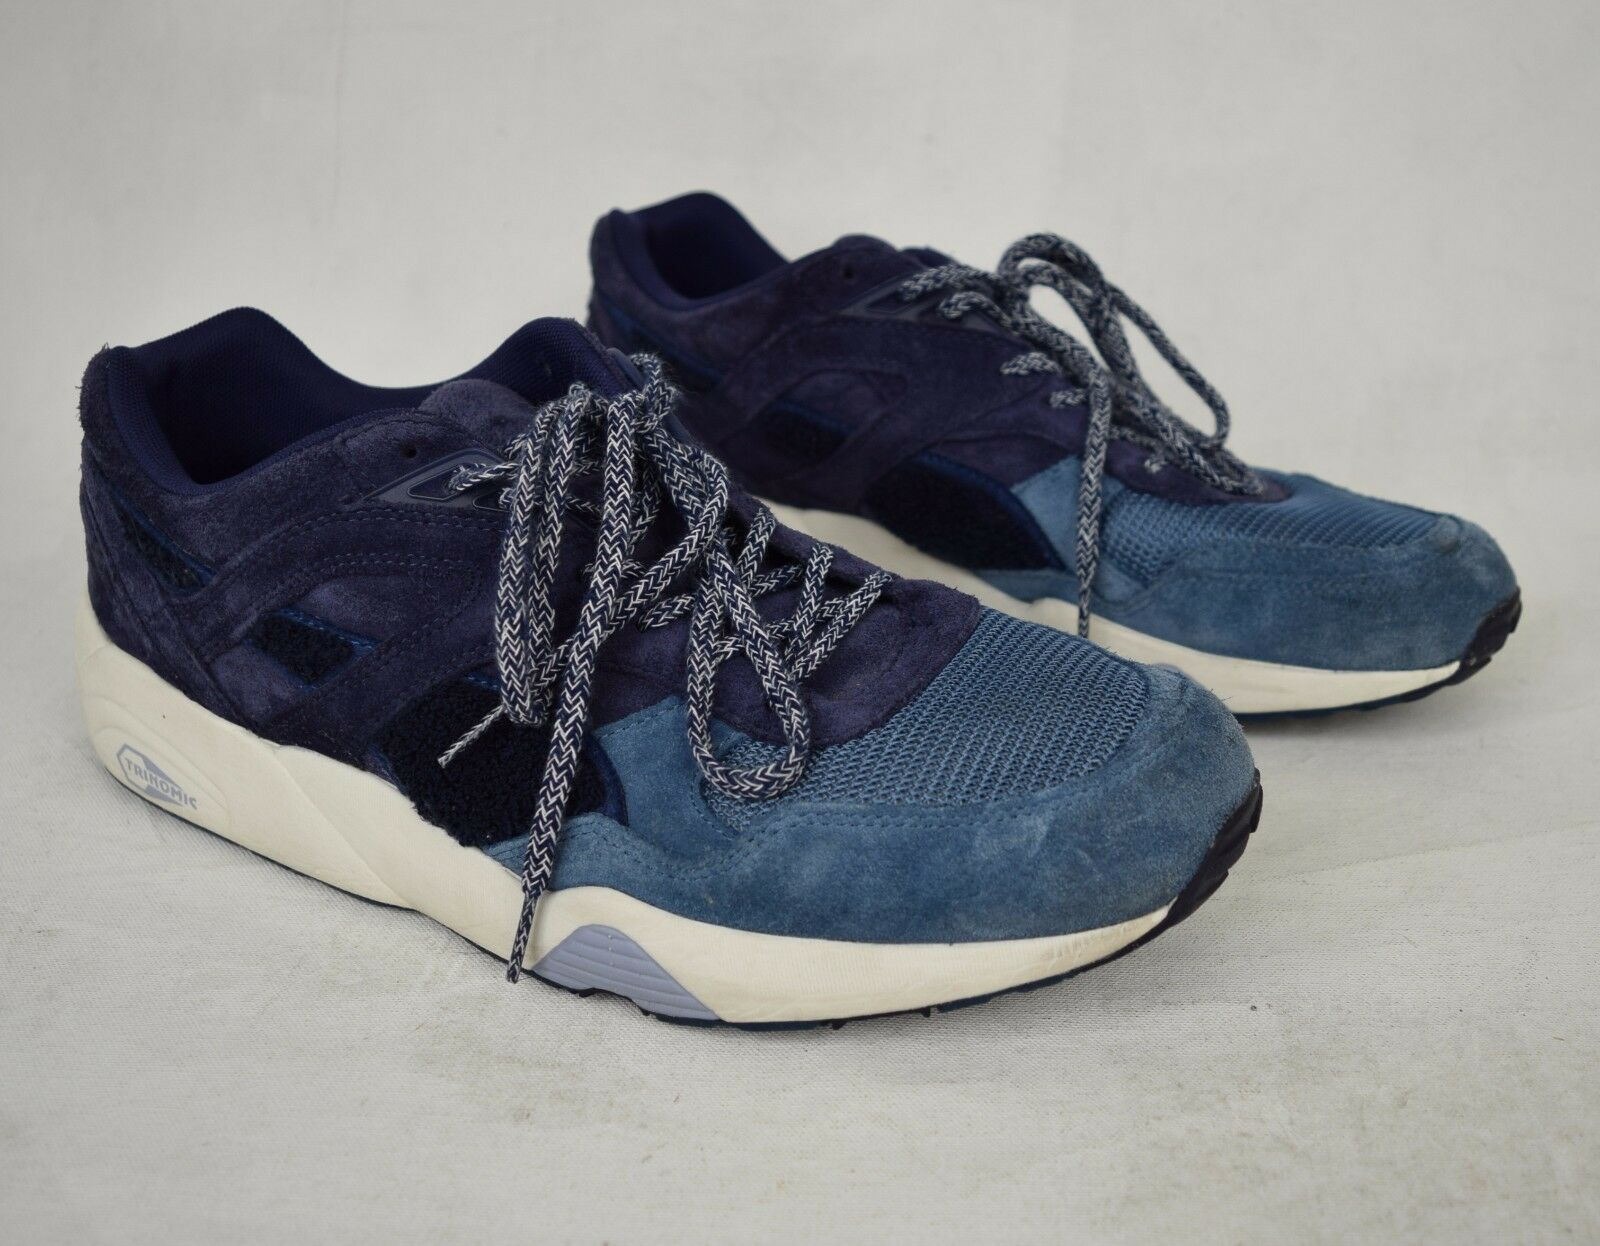 Puma shoes R698 OG x BWGH blueefield Medieval bluee Sneakers 11 Mens 357174 01